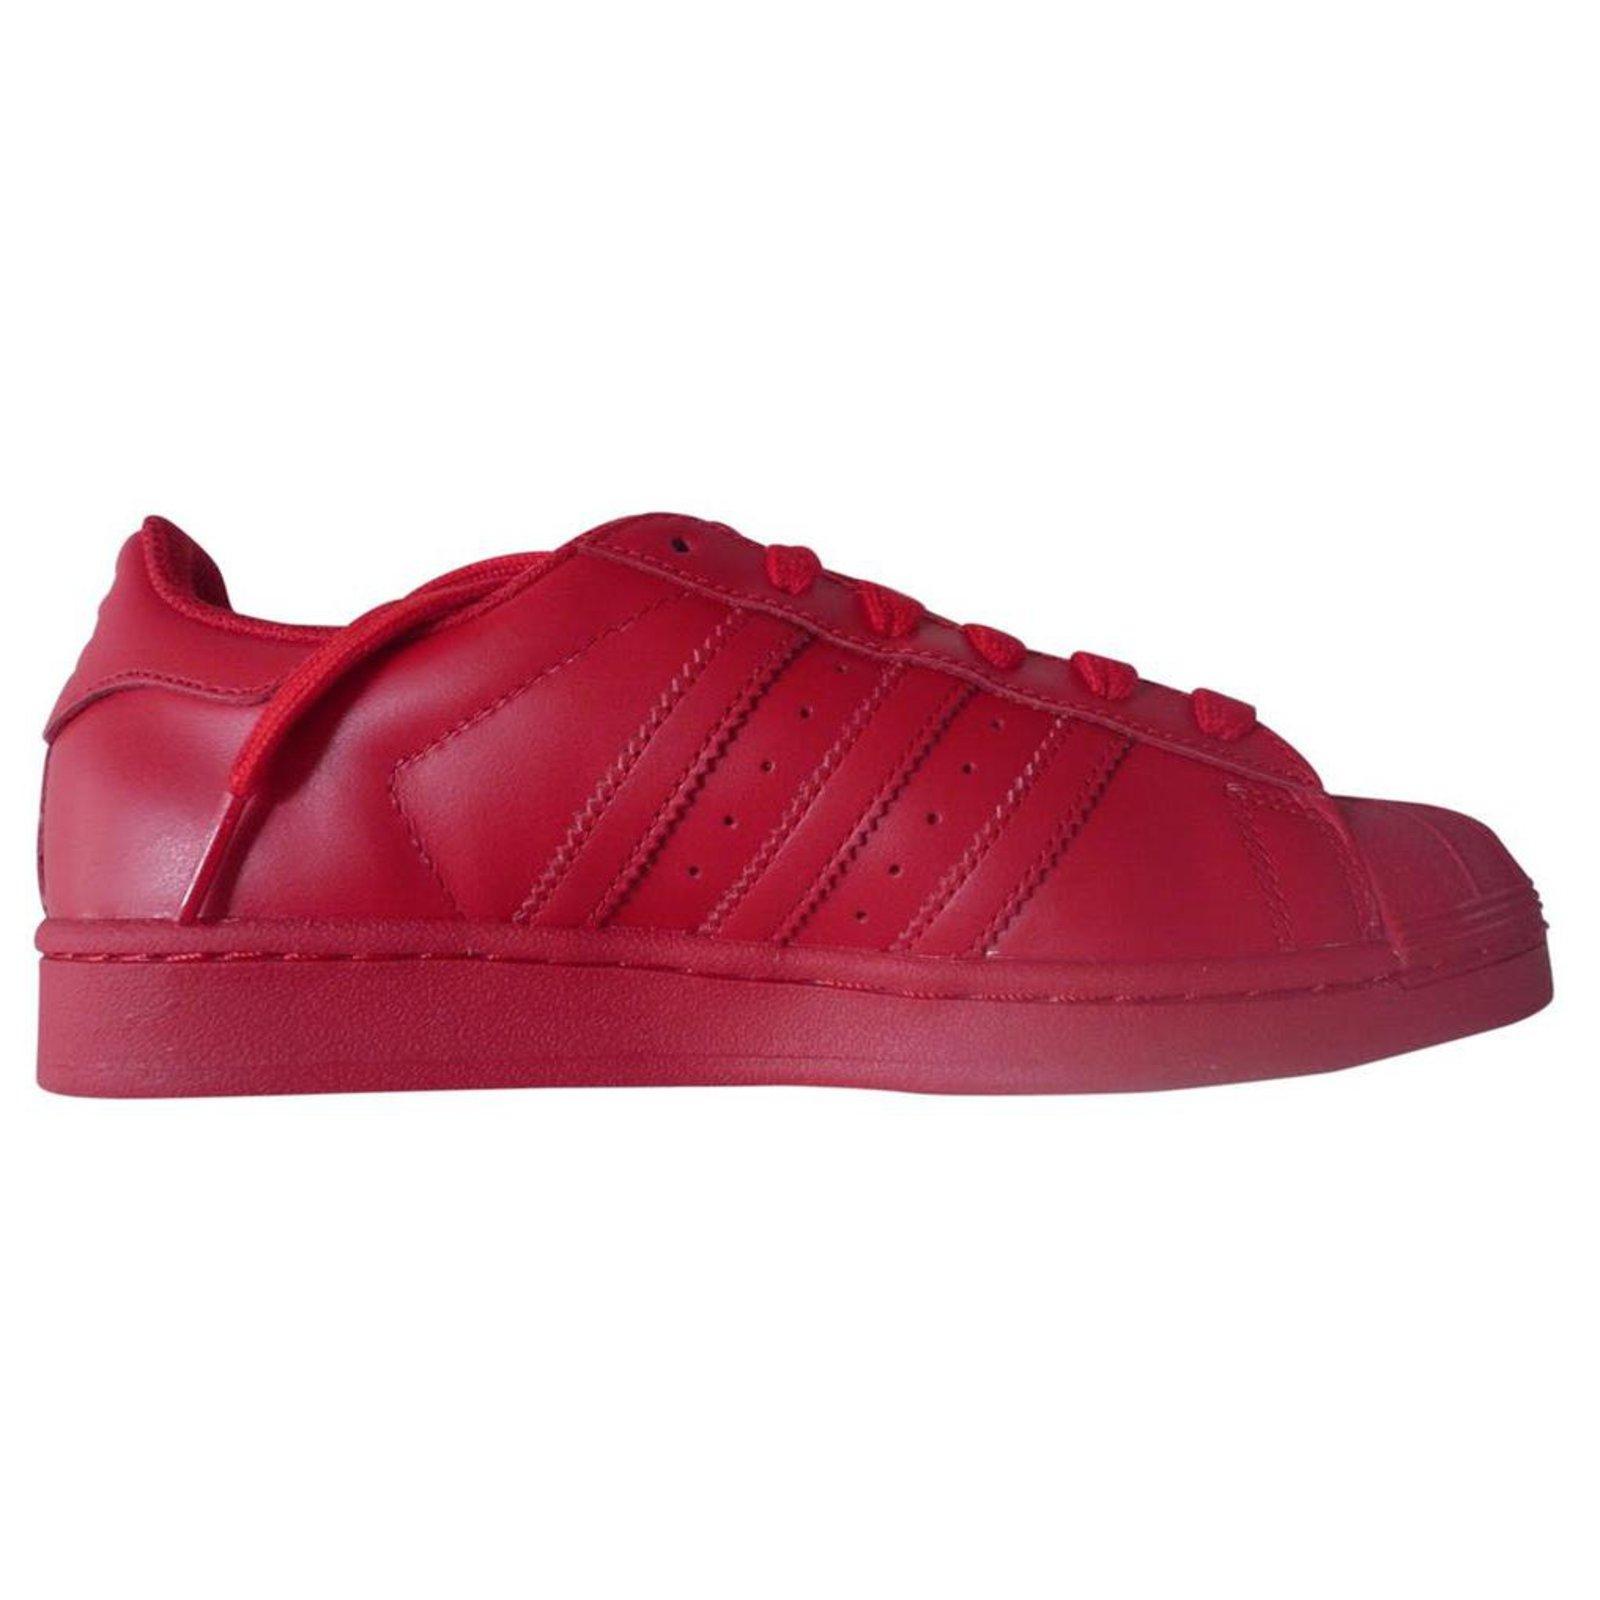 Adidas ADIDAS PHARRELL WILLIAMS NEW RED